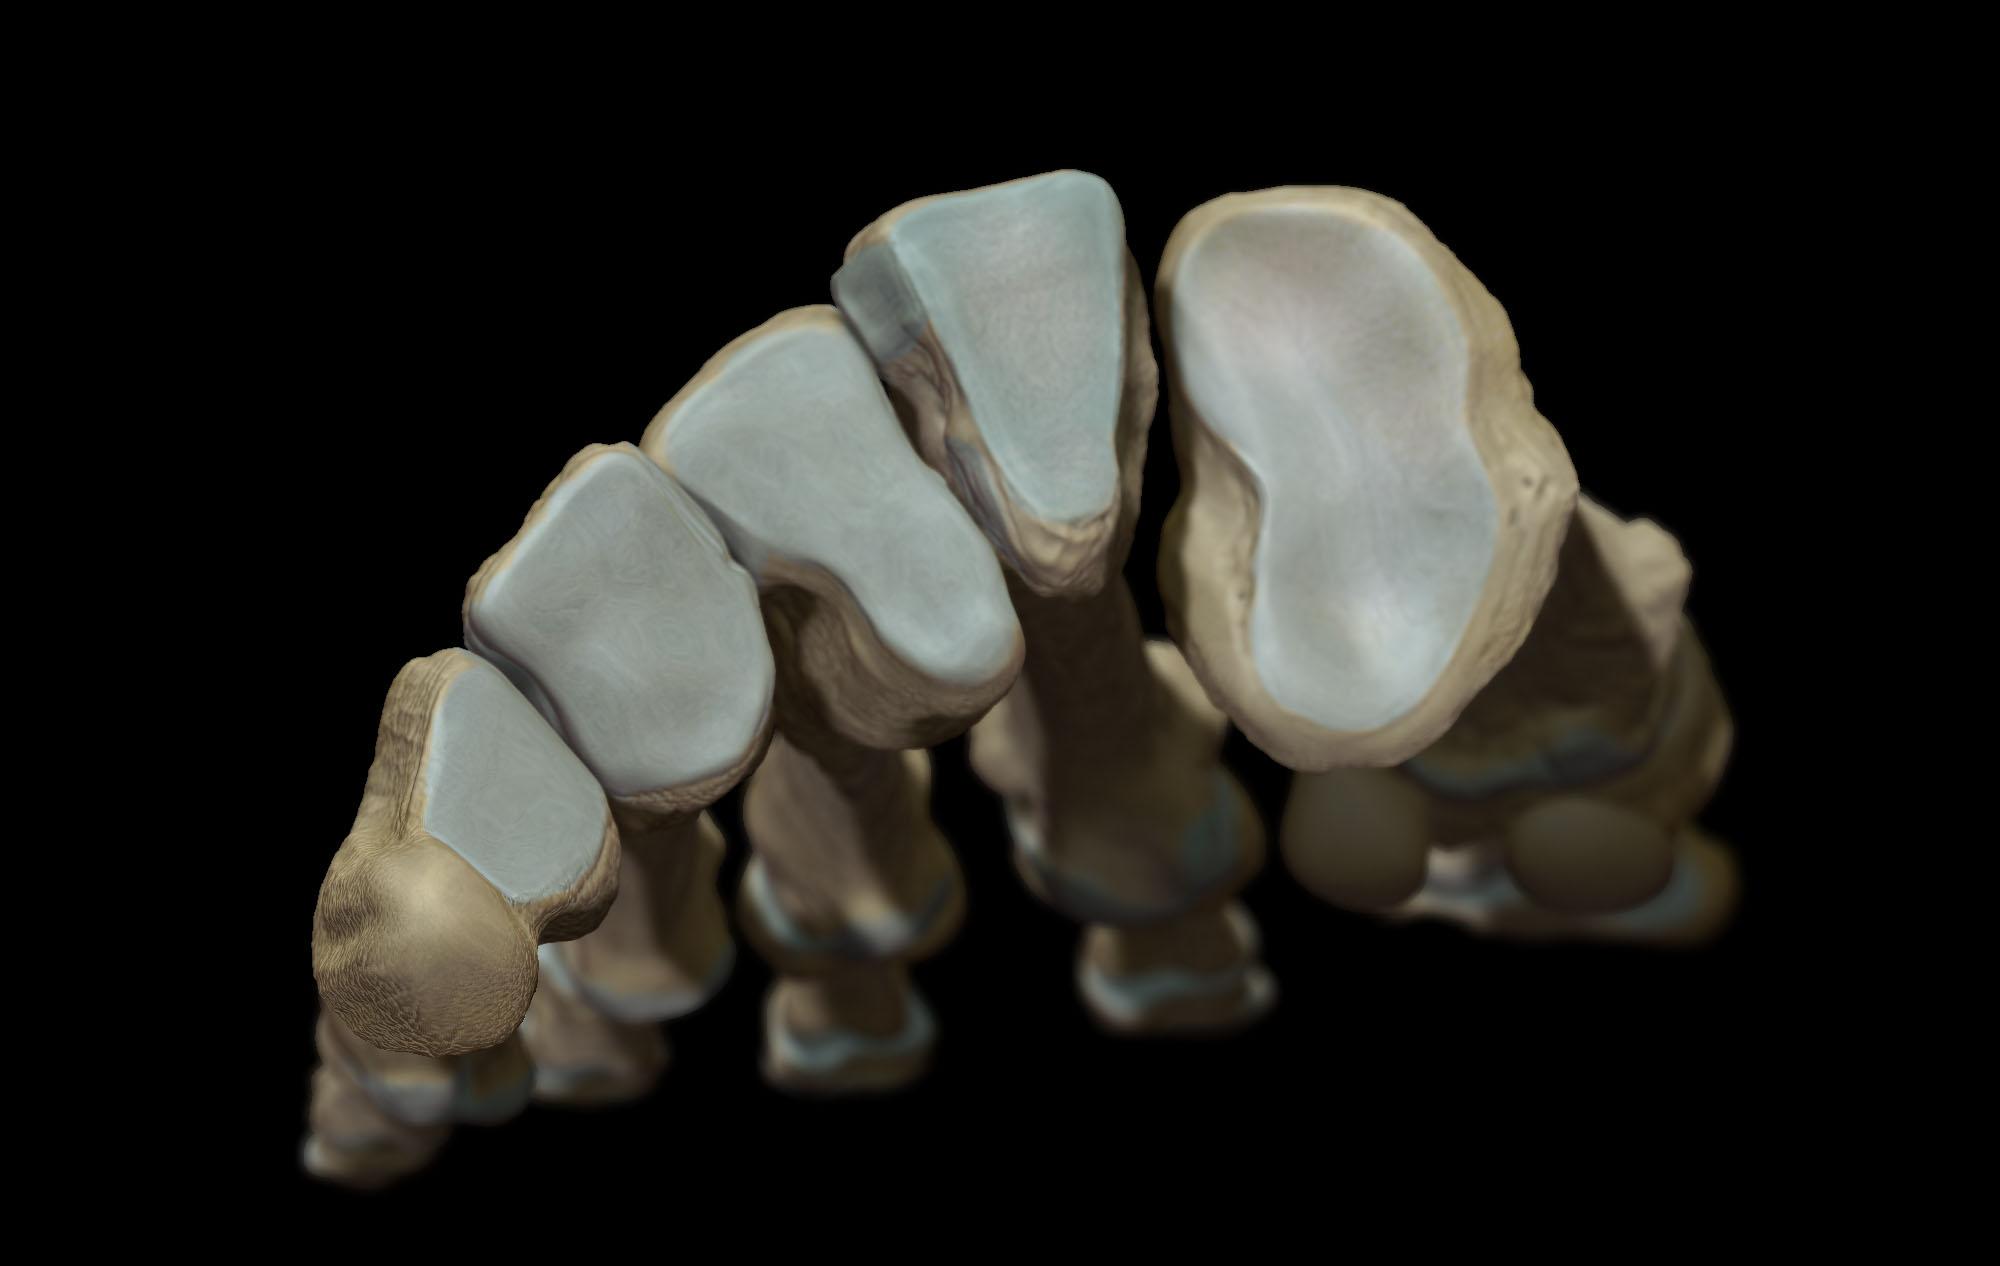 tarosmetatarsal joints render, anatomy medical illustration Zbrush sculpt